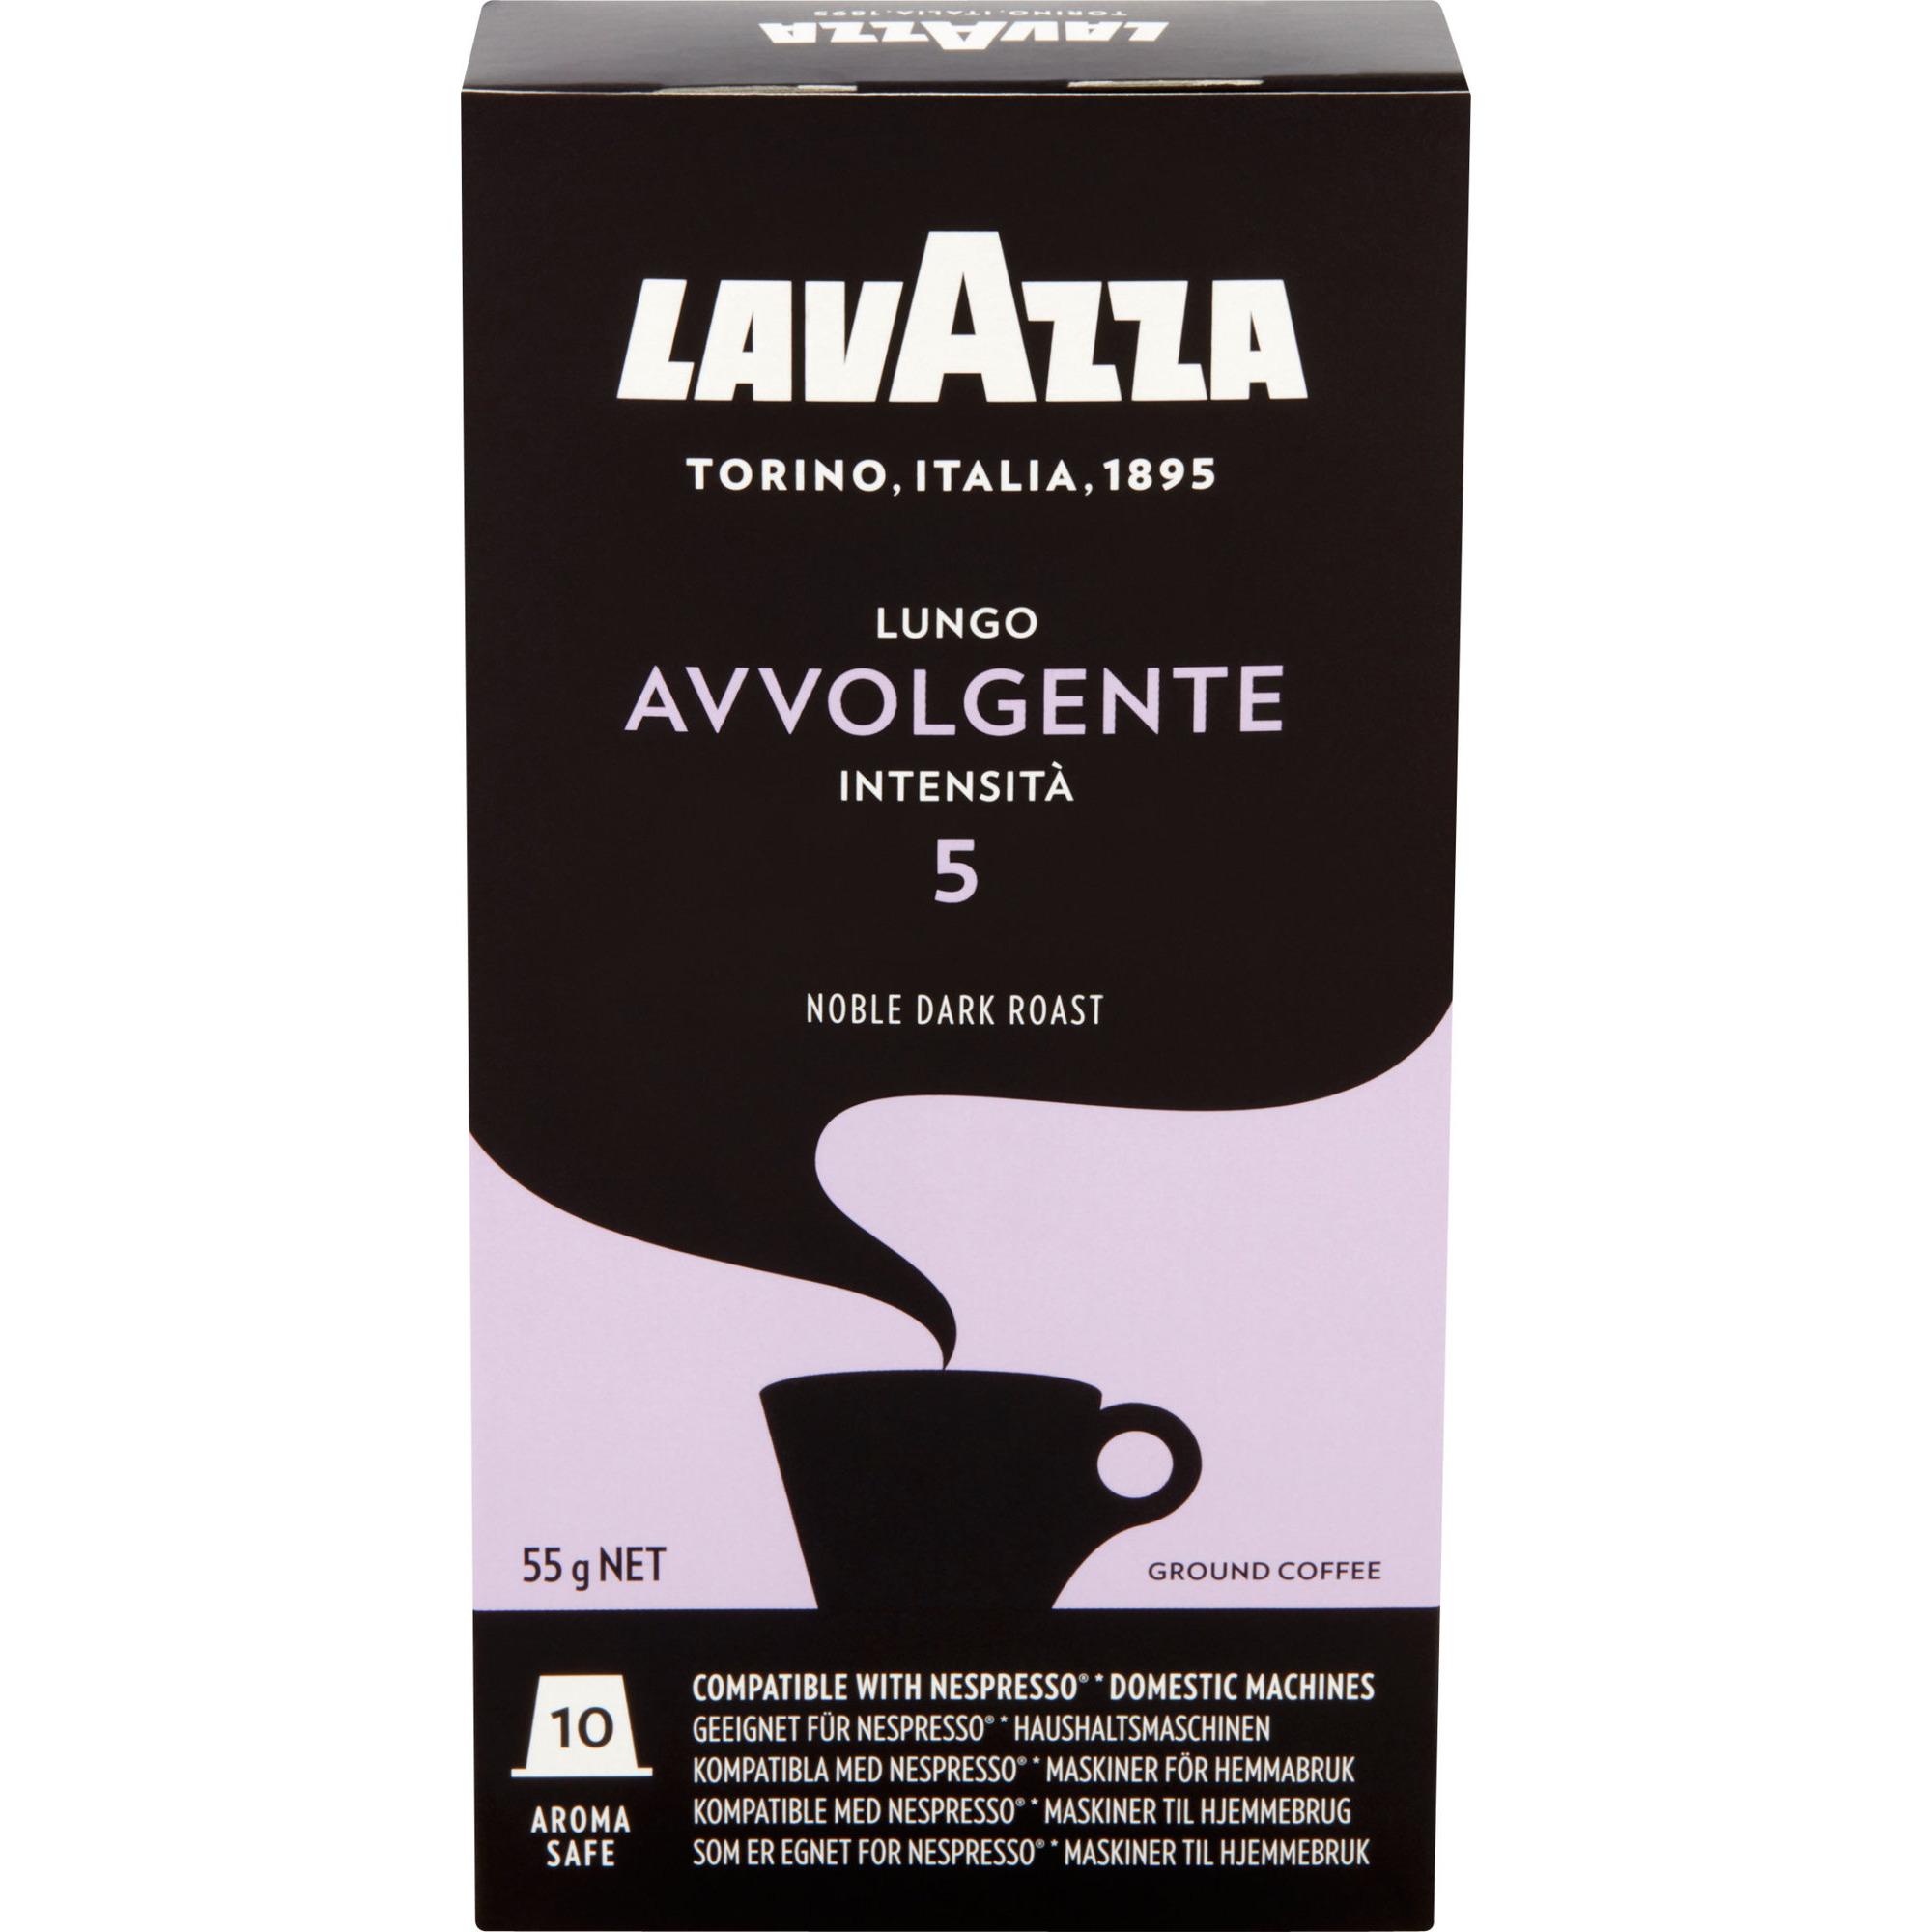 Lavazza Lungo Avvolgente kaffekapslar